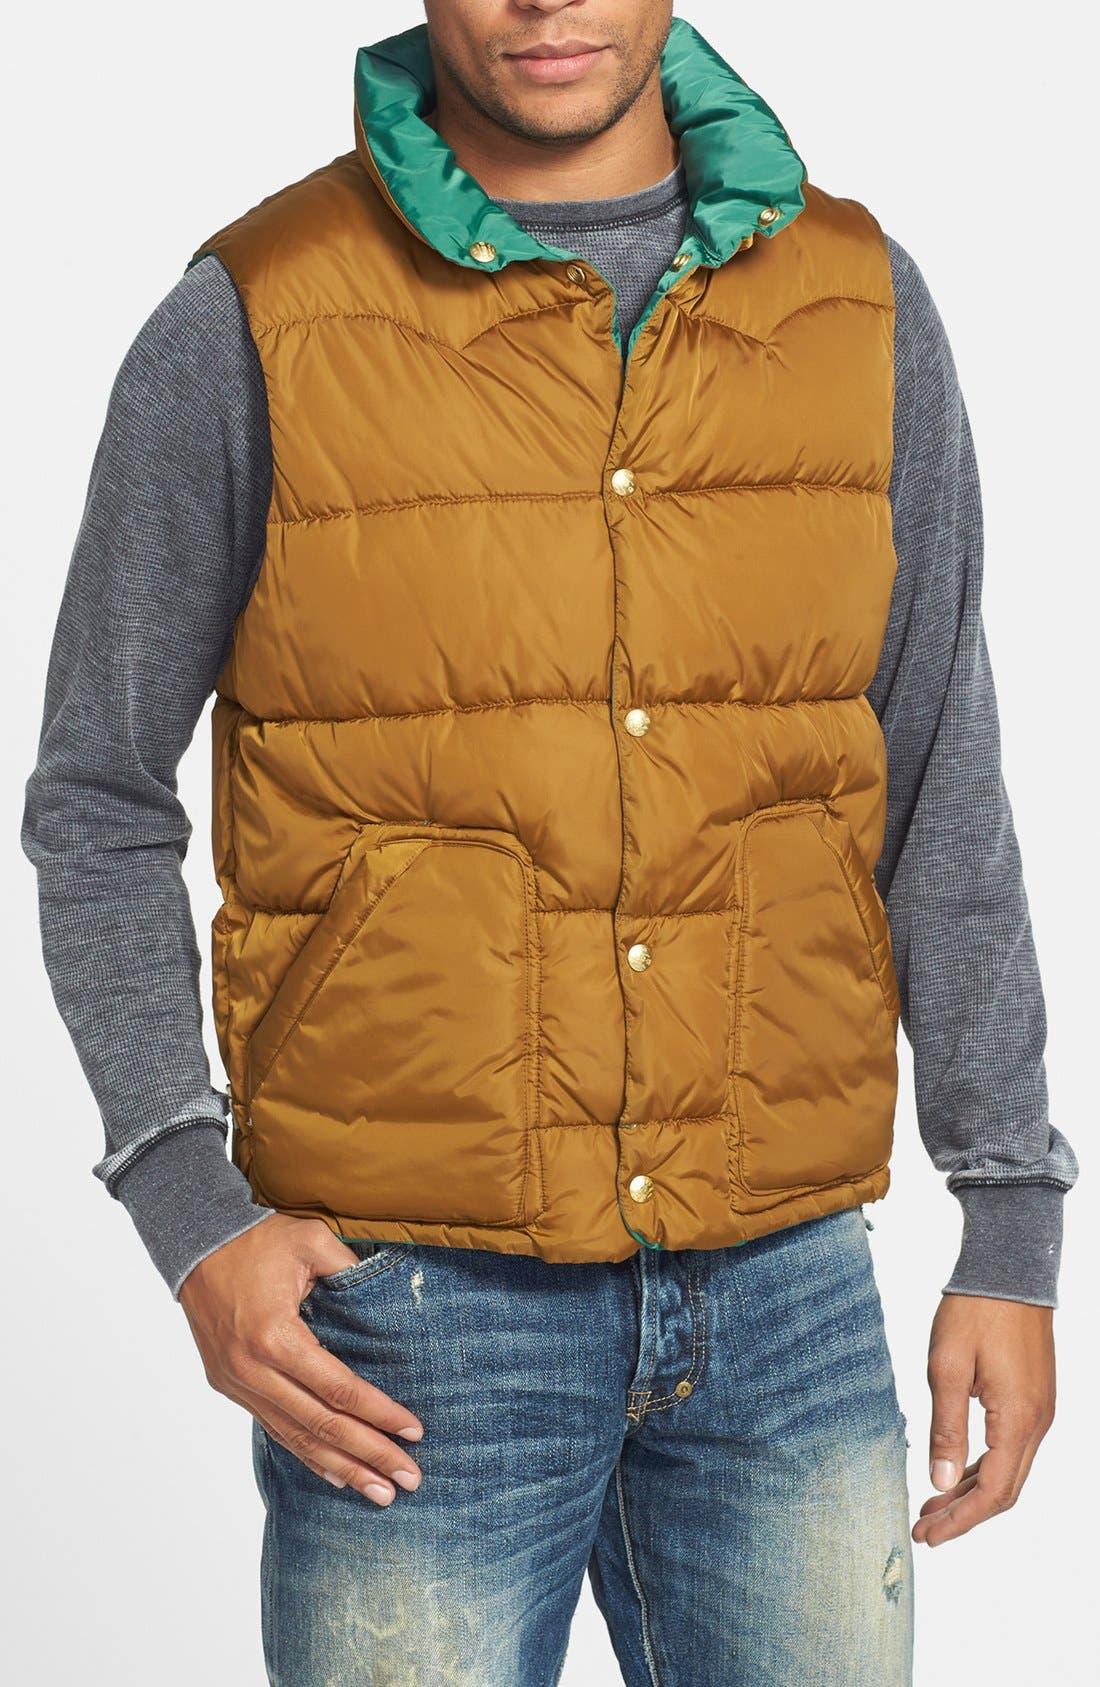 Reversible Quilted Vest,                             Alternate thumbnail 5, color,                             310